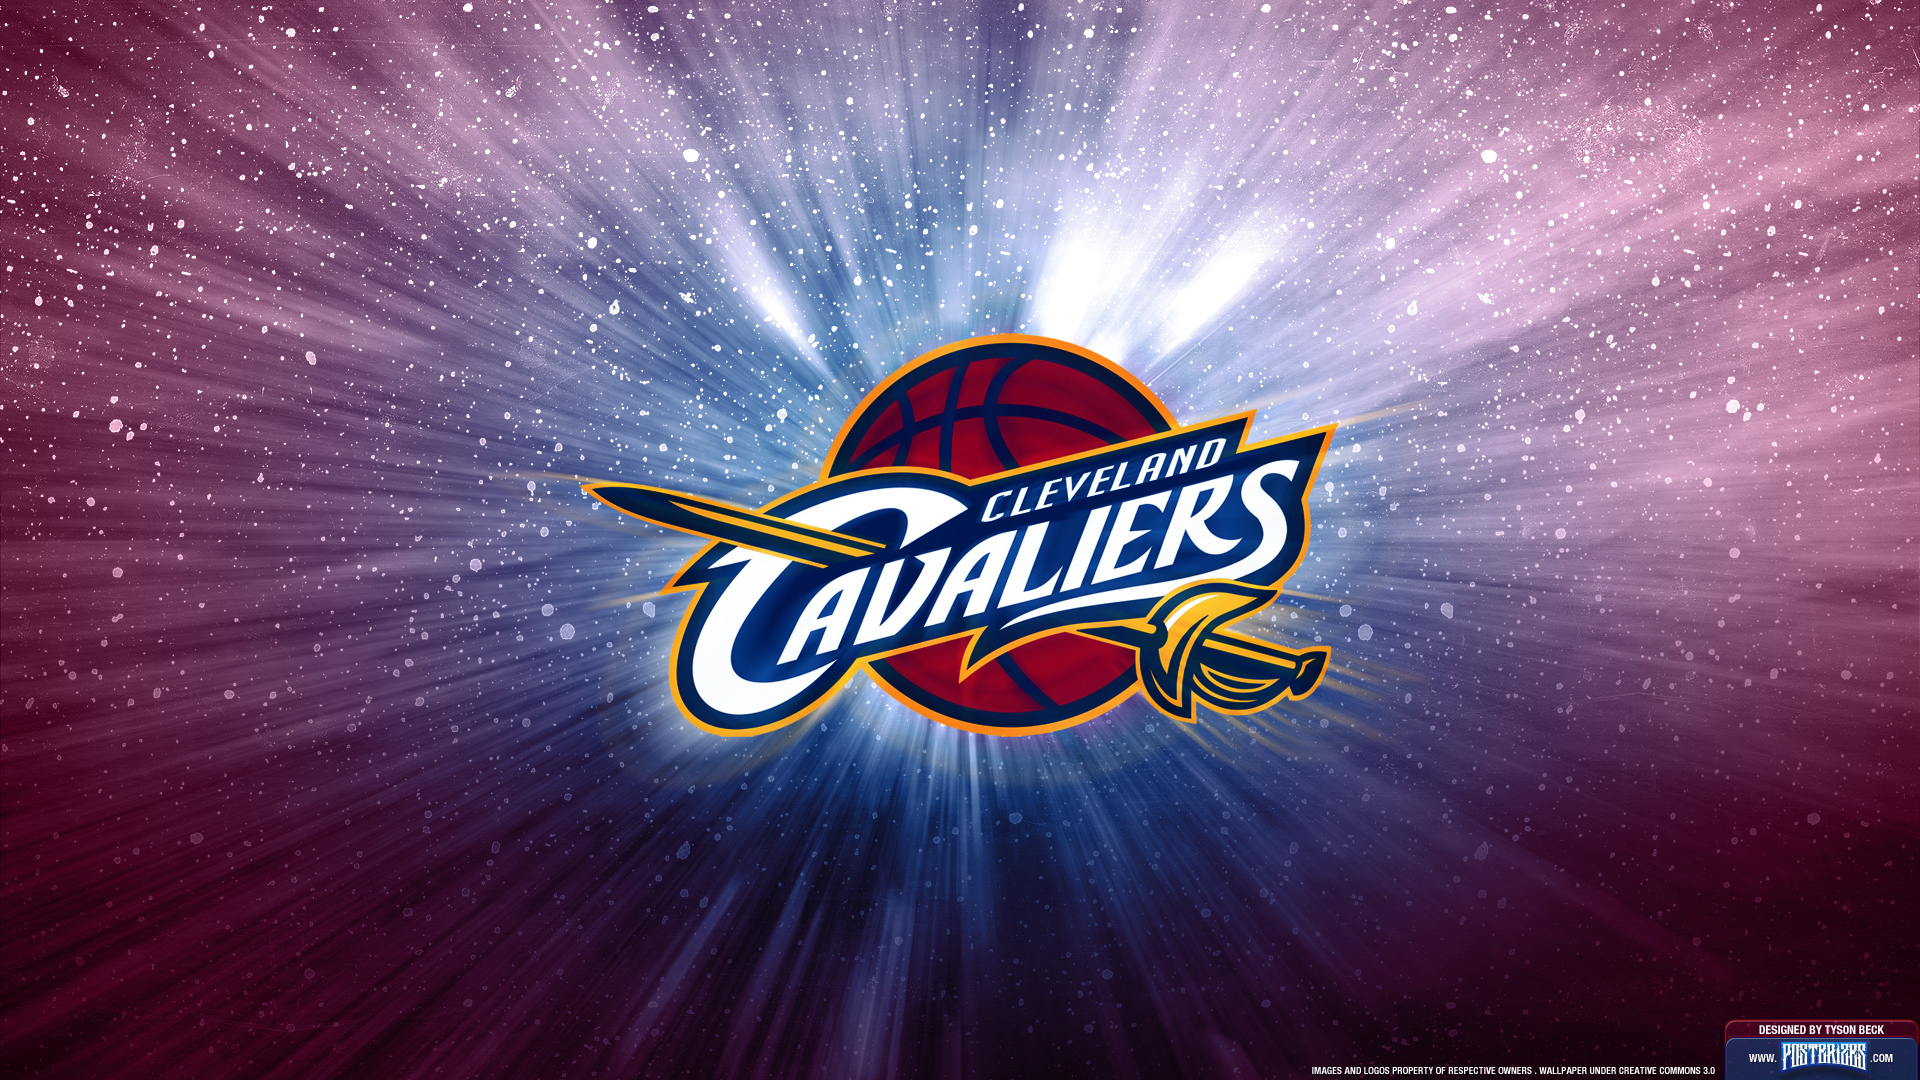 Cleveland Cavaliers Logo Wallpaper 1920x1080